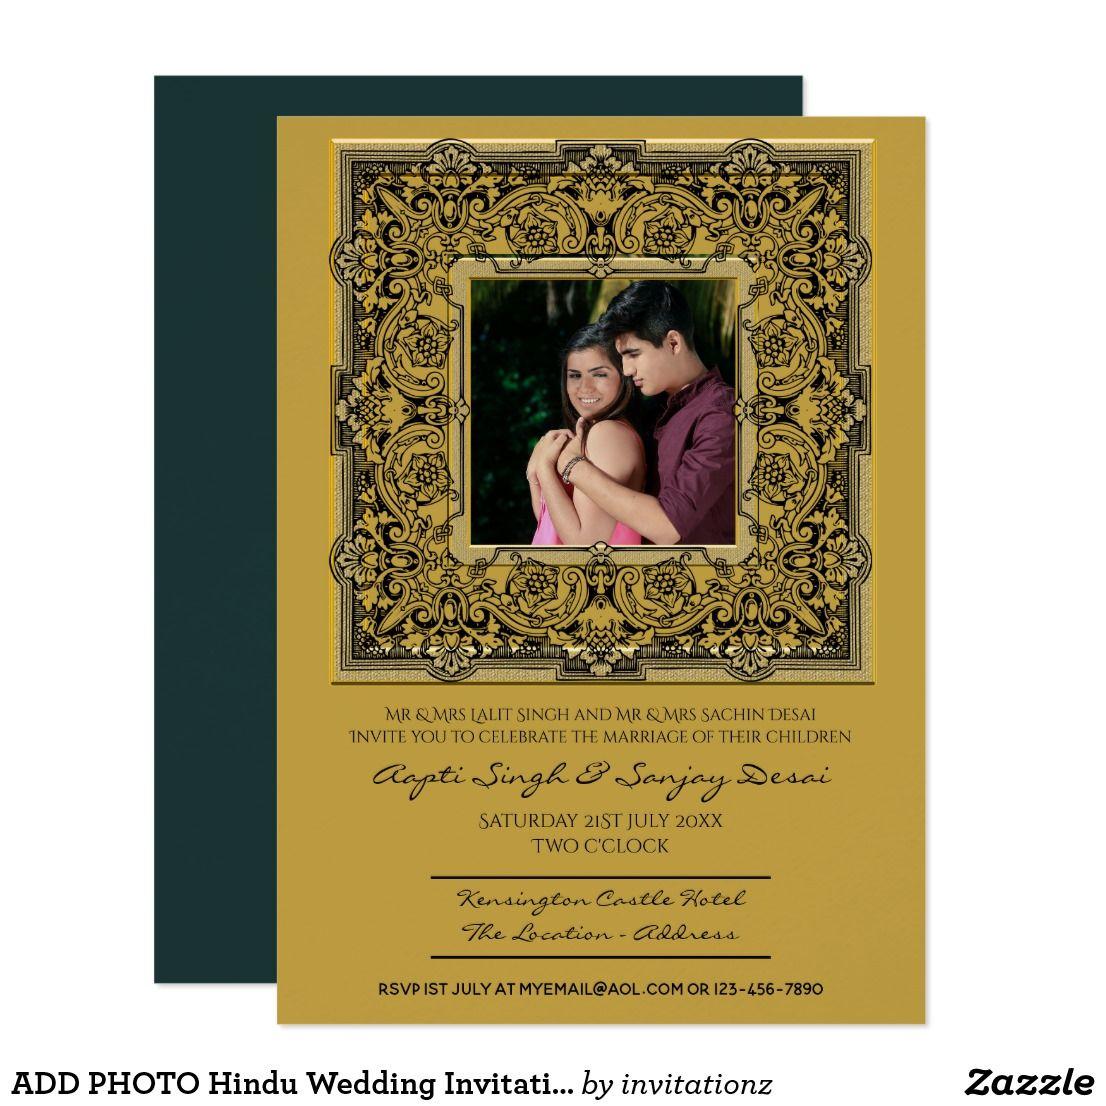 Add Photo Hindu Wedding Invitations Edit Colors Hindu Weddings